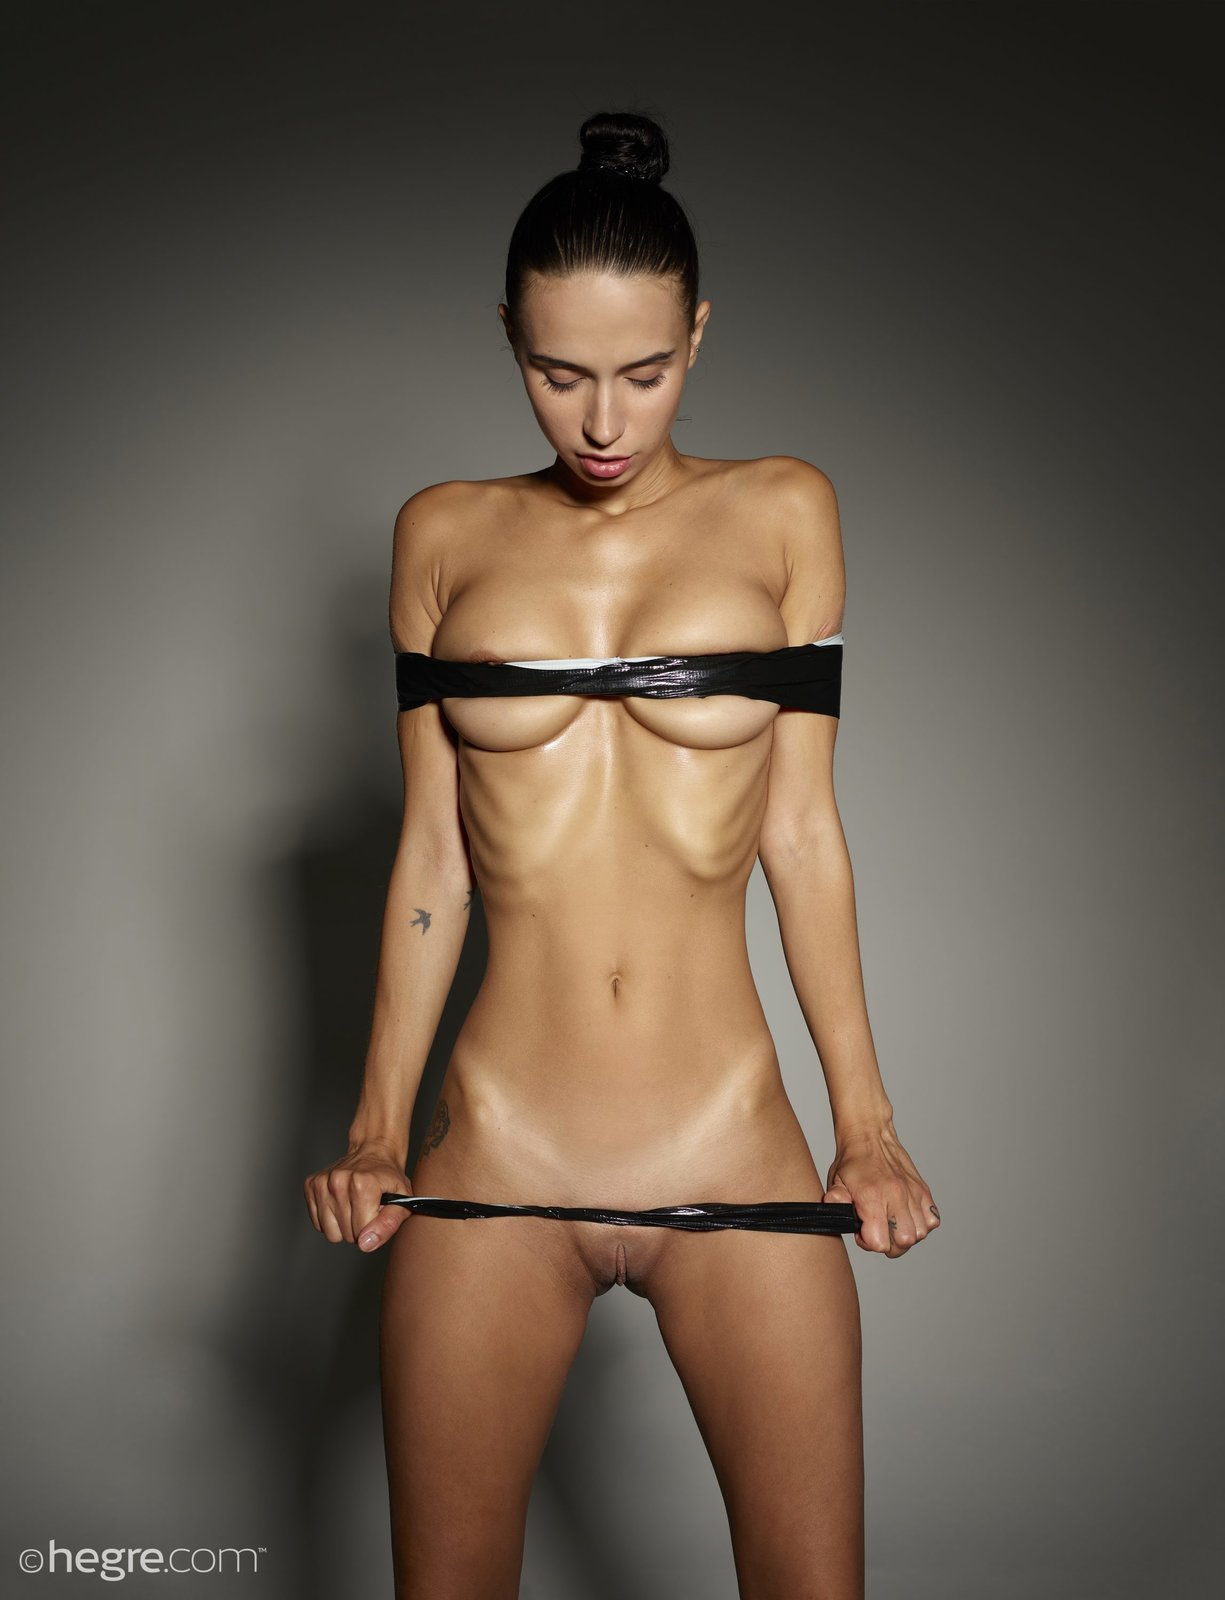 Free Legal Nude Pics